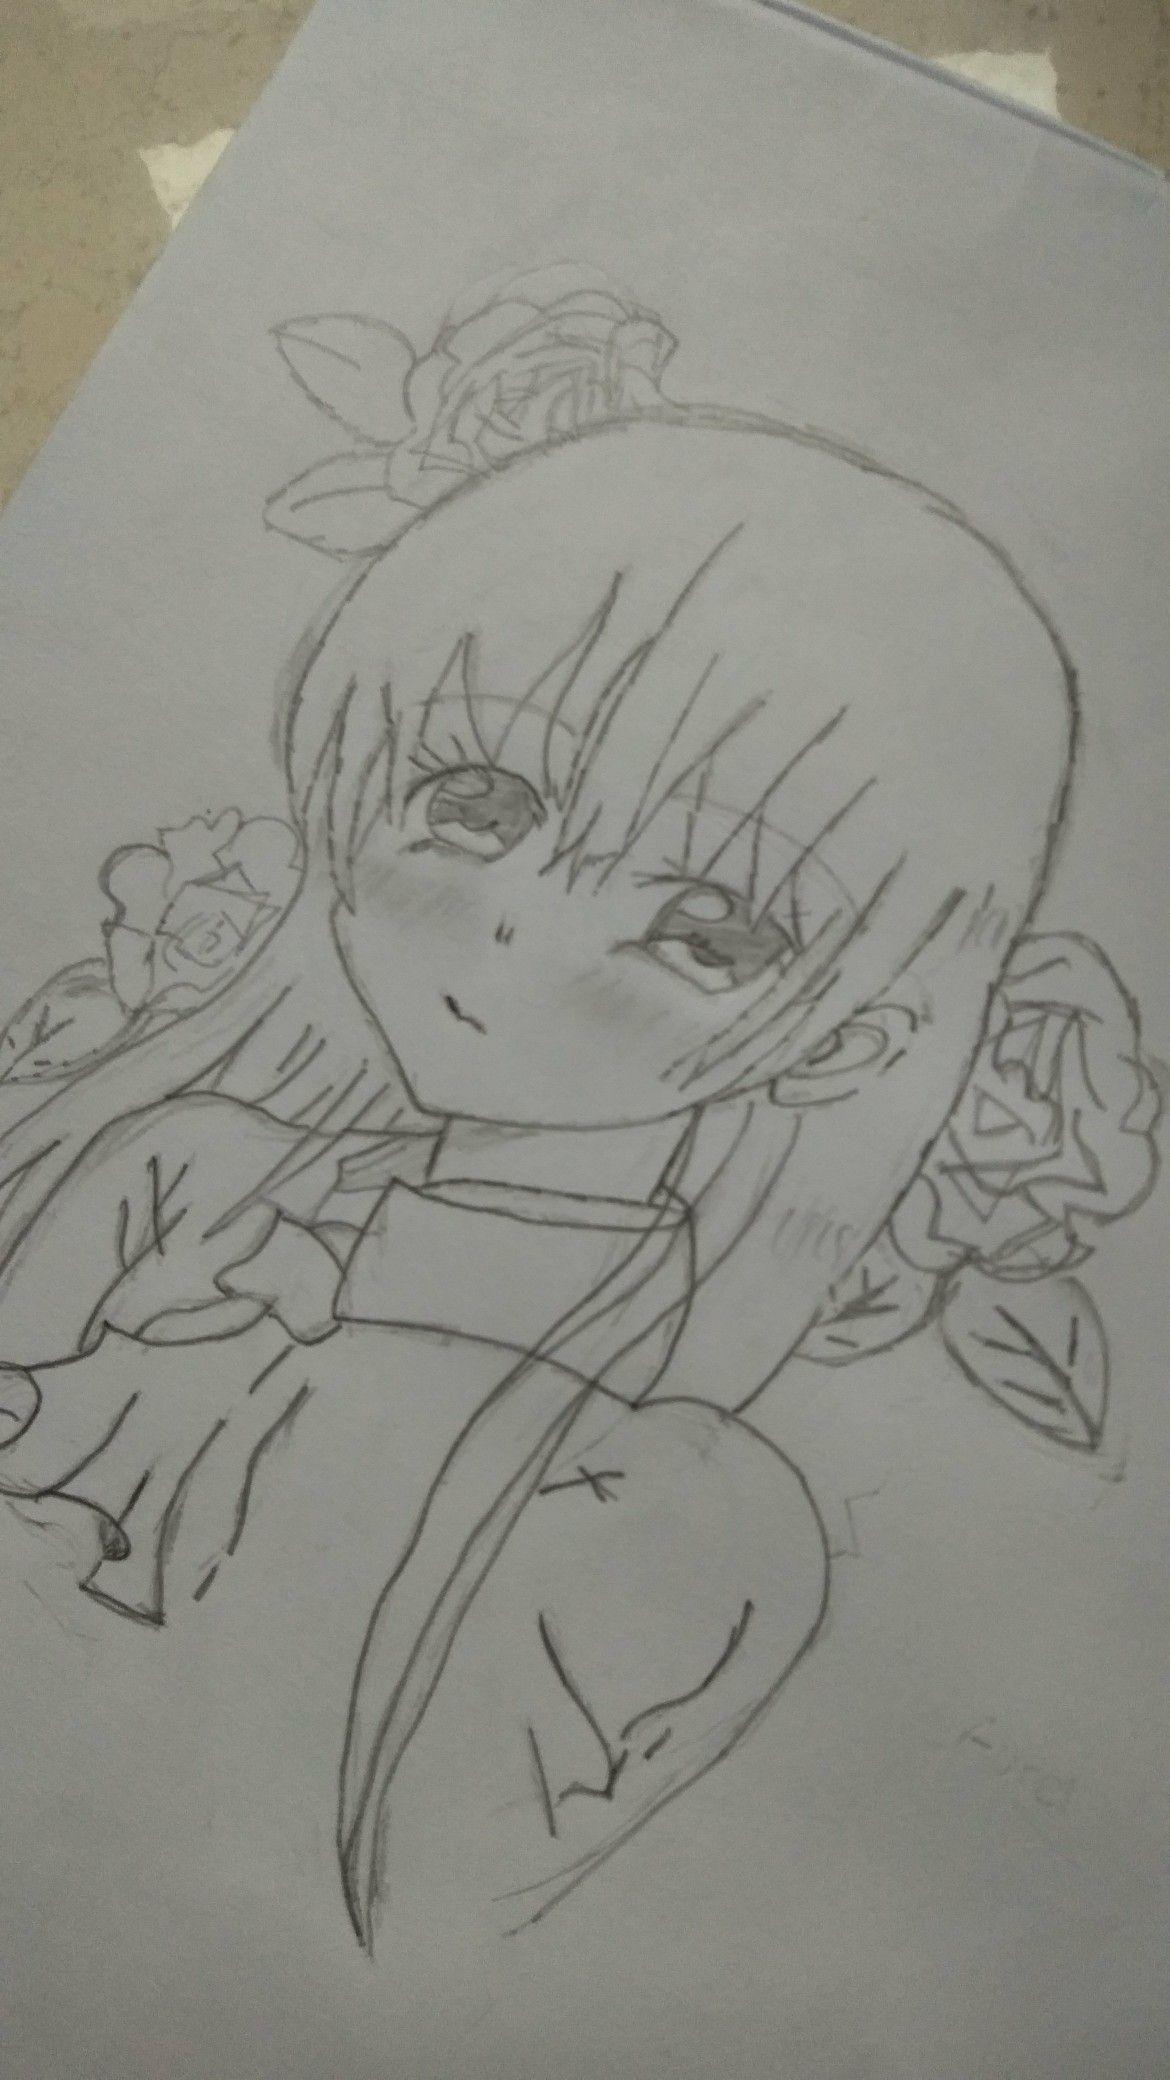 80 Gambar Anime Keren Pake Pensil Terlihat Keren